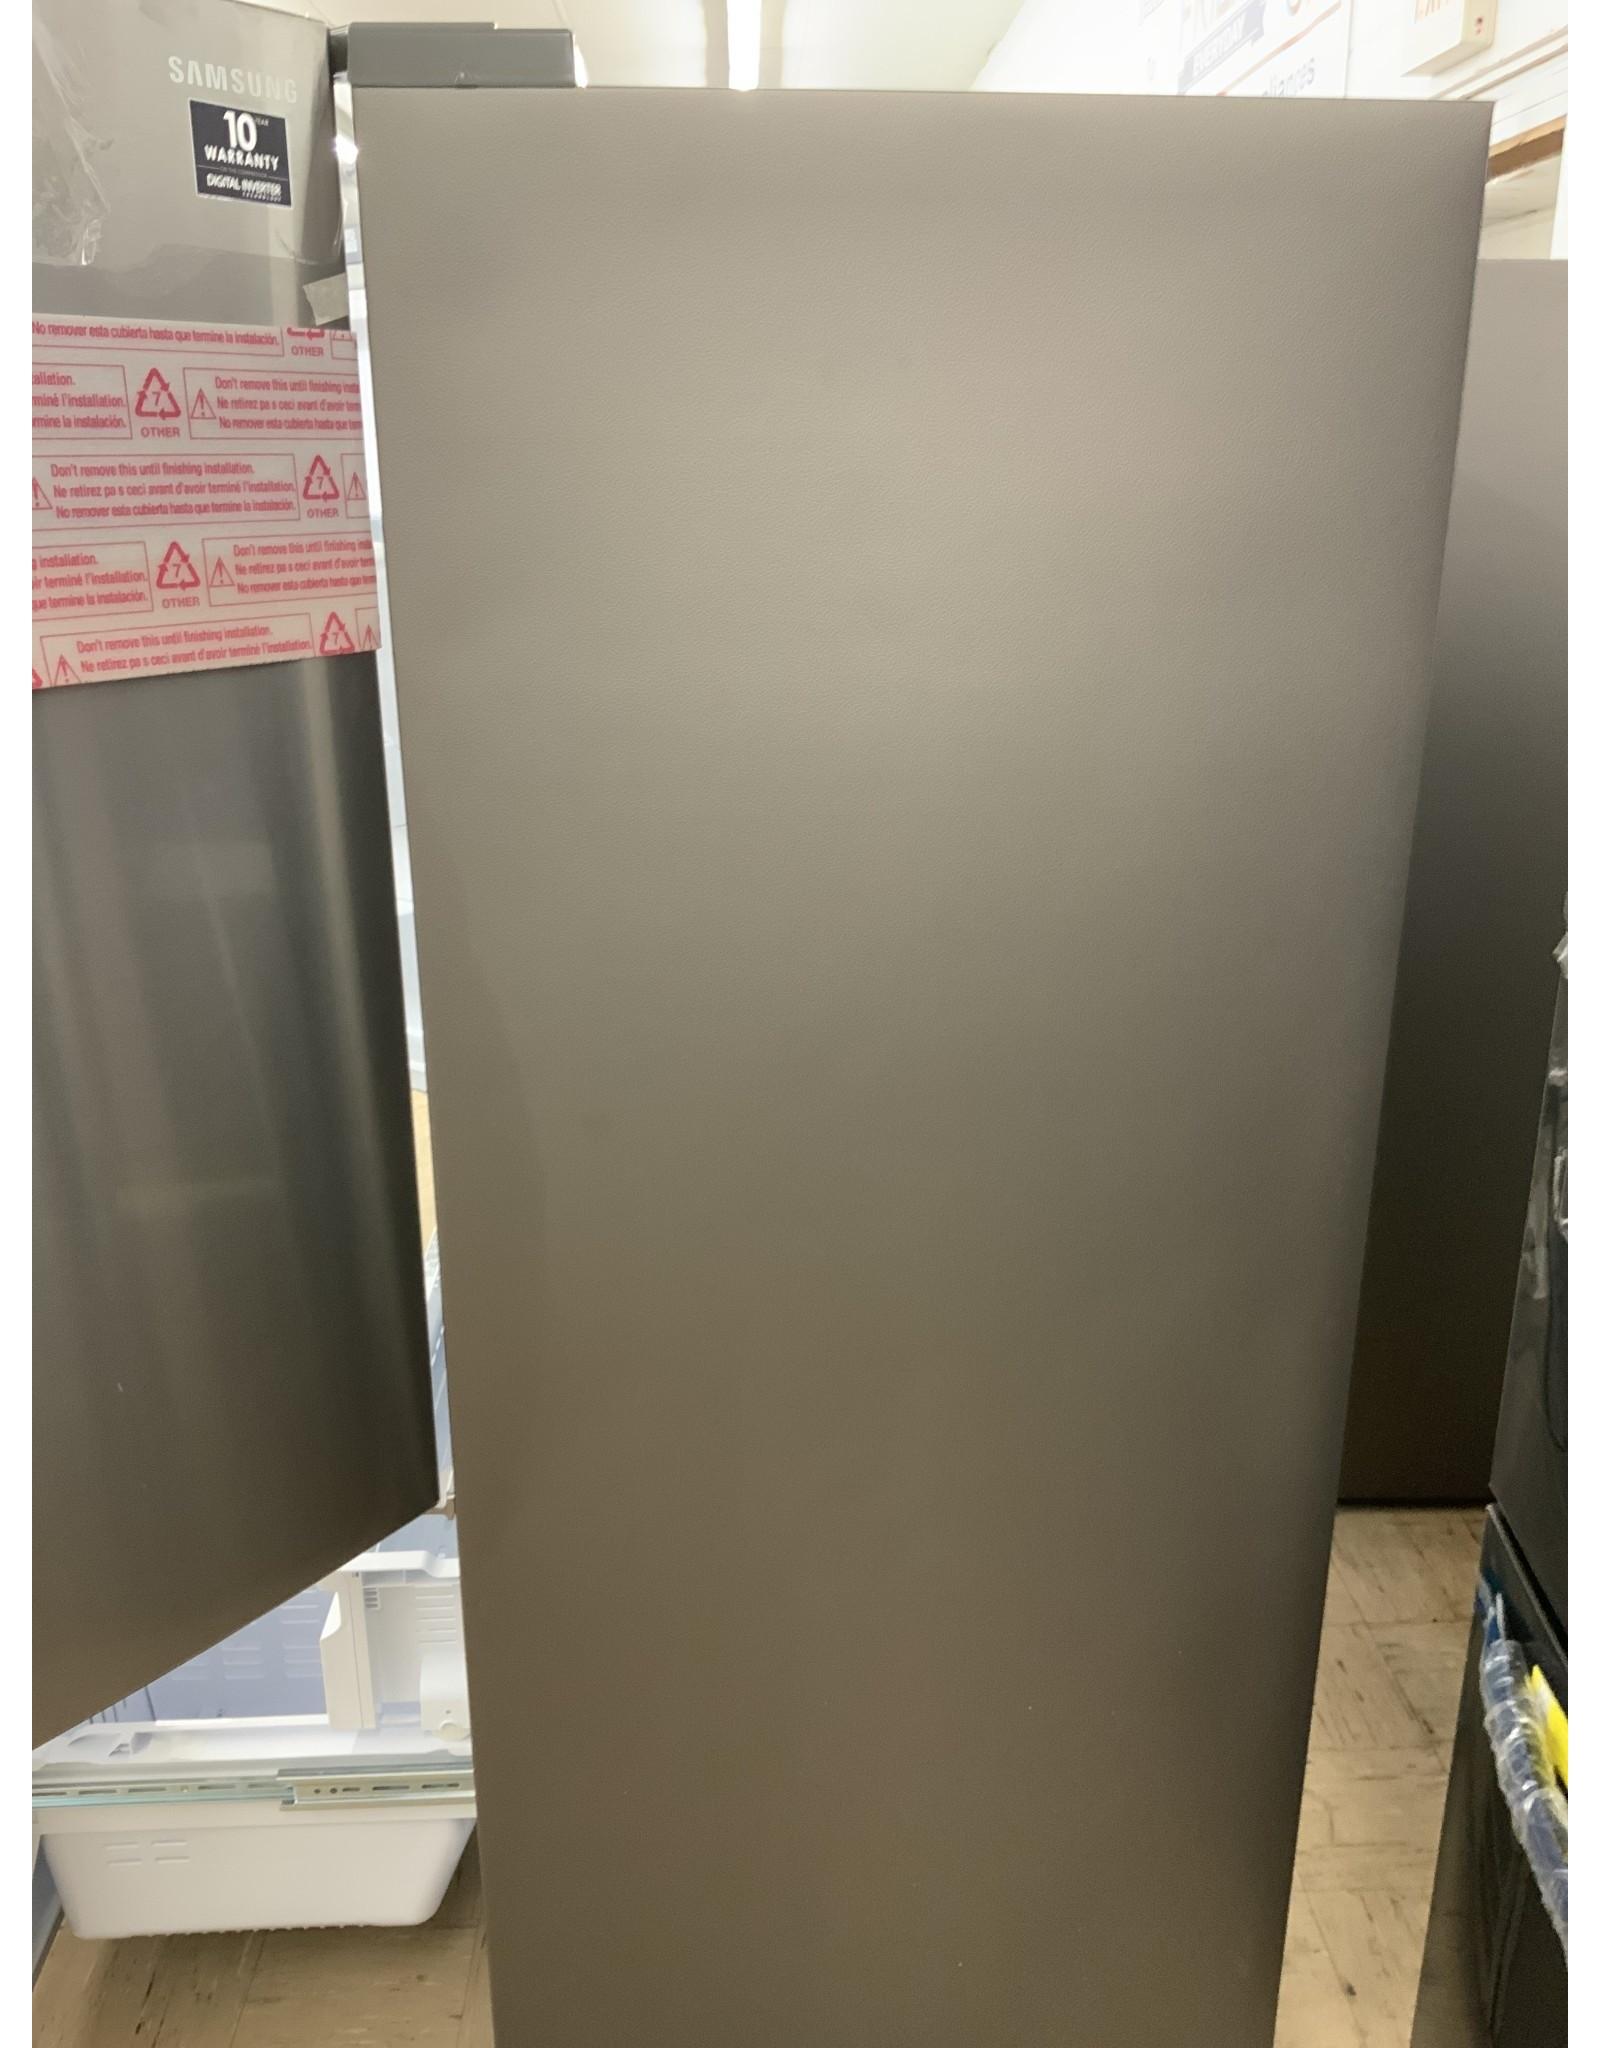 SAMSUNG RF263TEAESR-3-KIT Samsung 26 Cu.Ft. French Door (RF263TEAESR) and 2 A-Top Filter (HAFCU1/XAA)